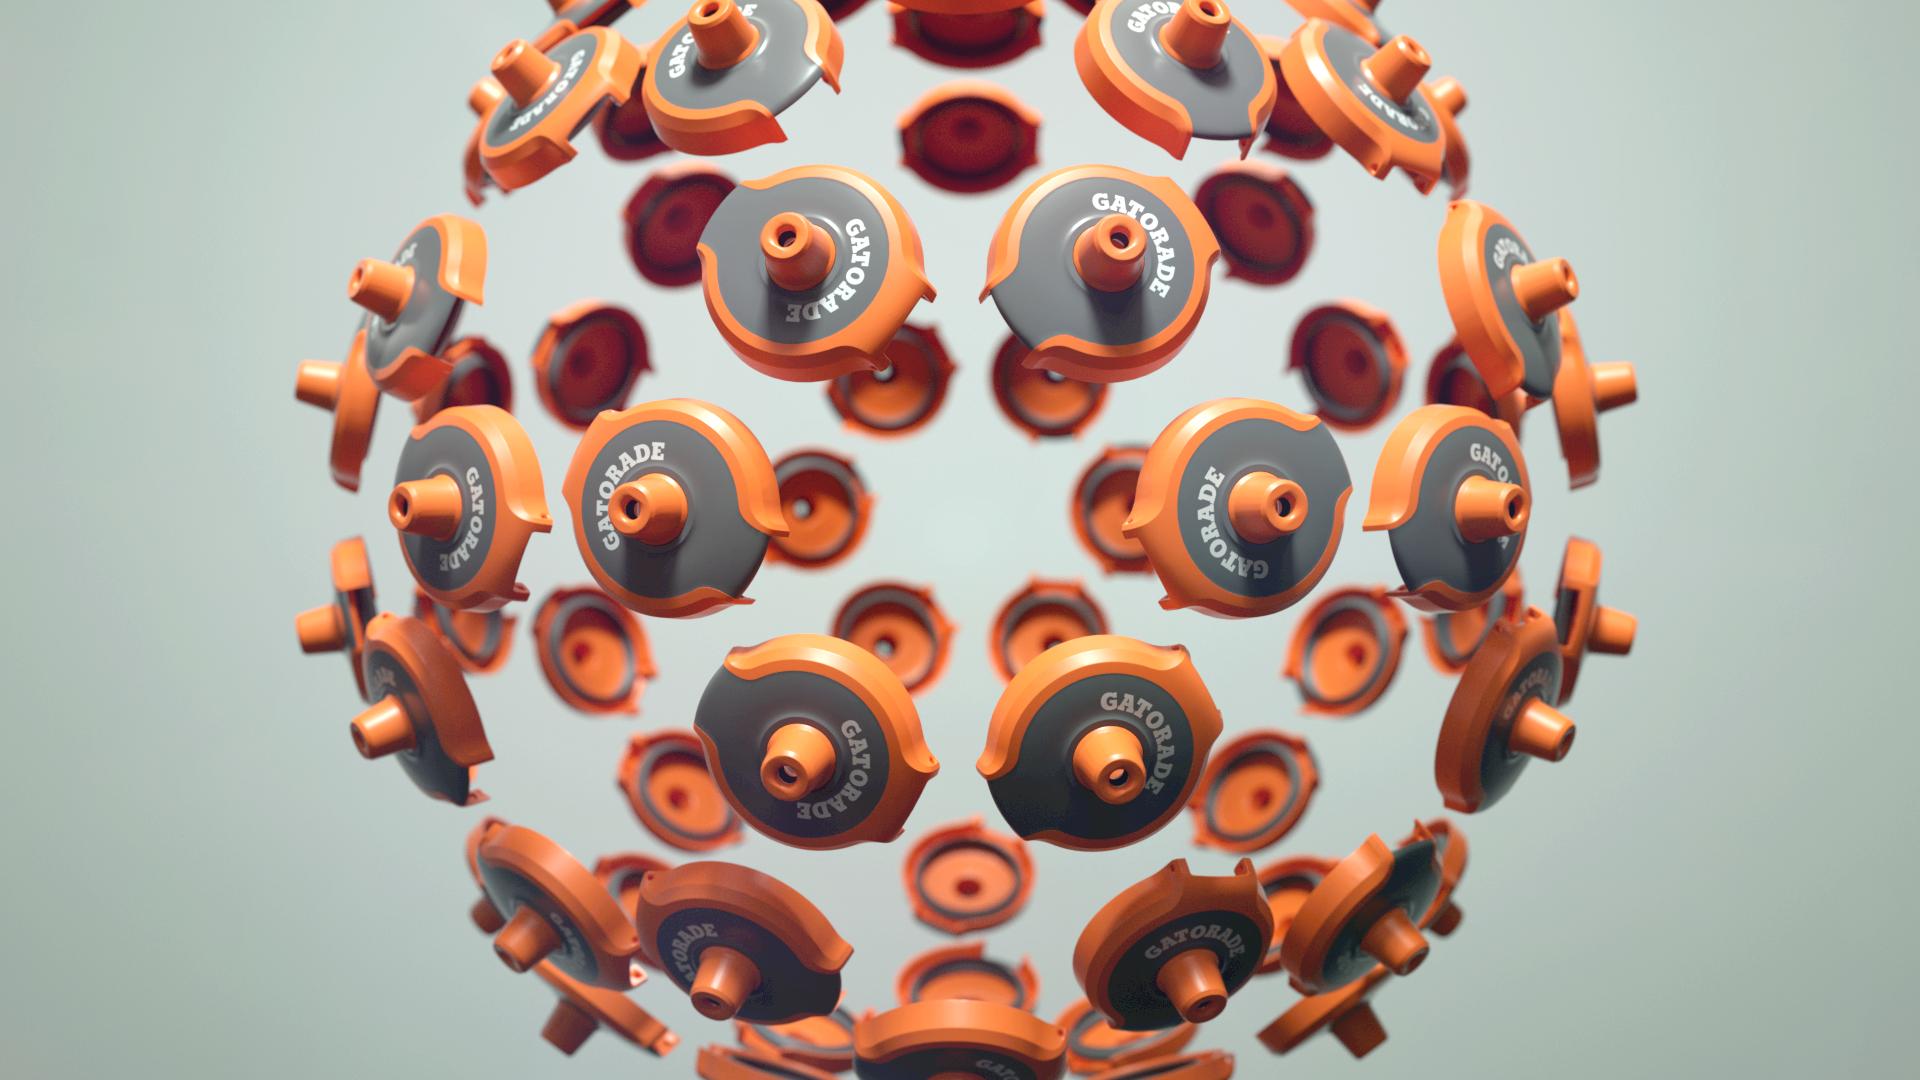 Orange-lidshphere-001_0000_00000.png